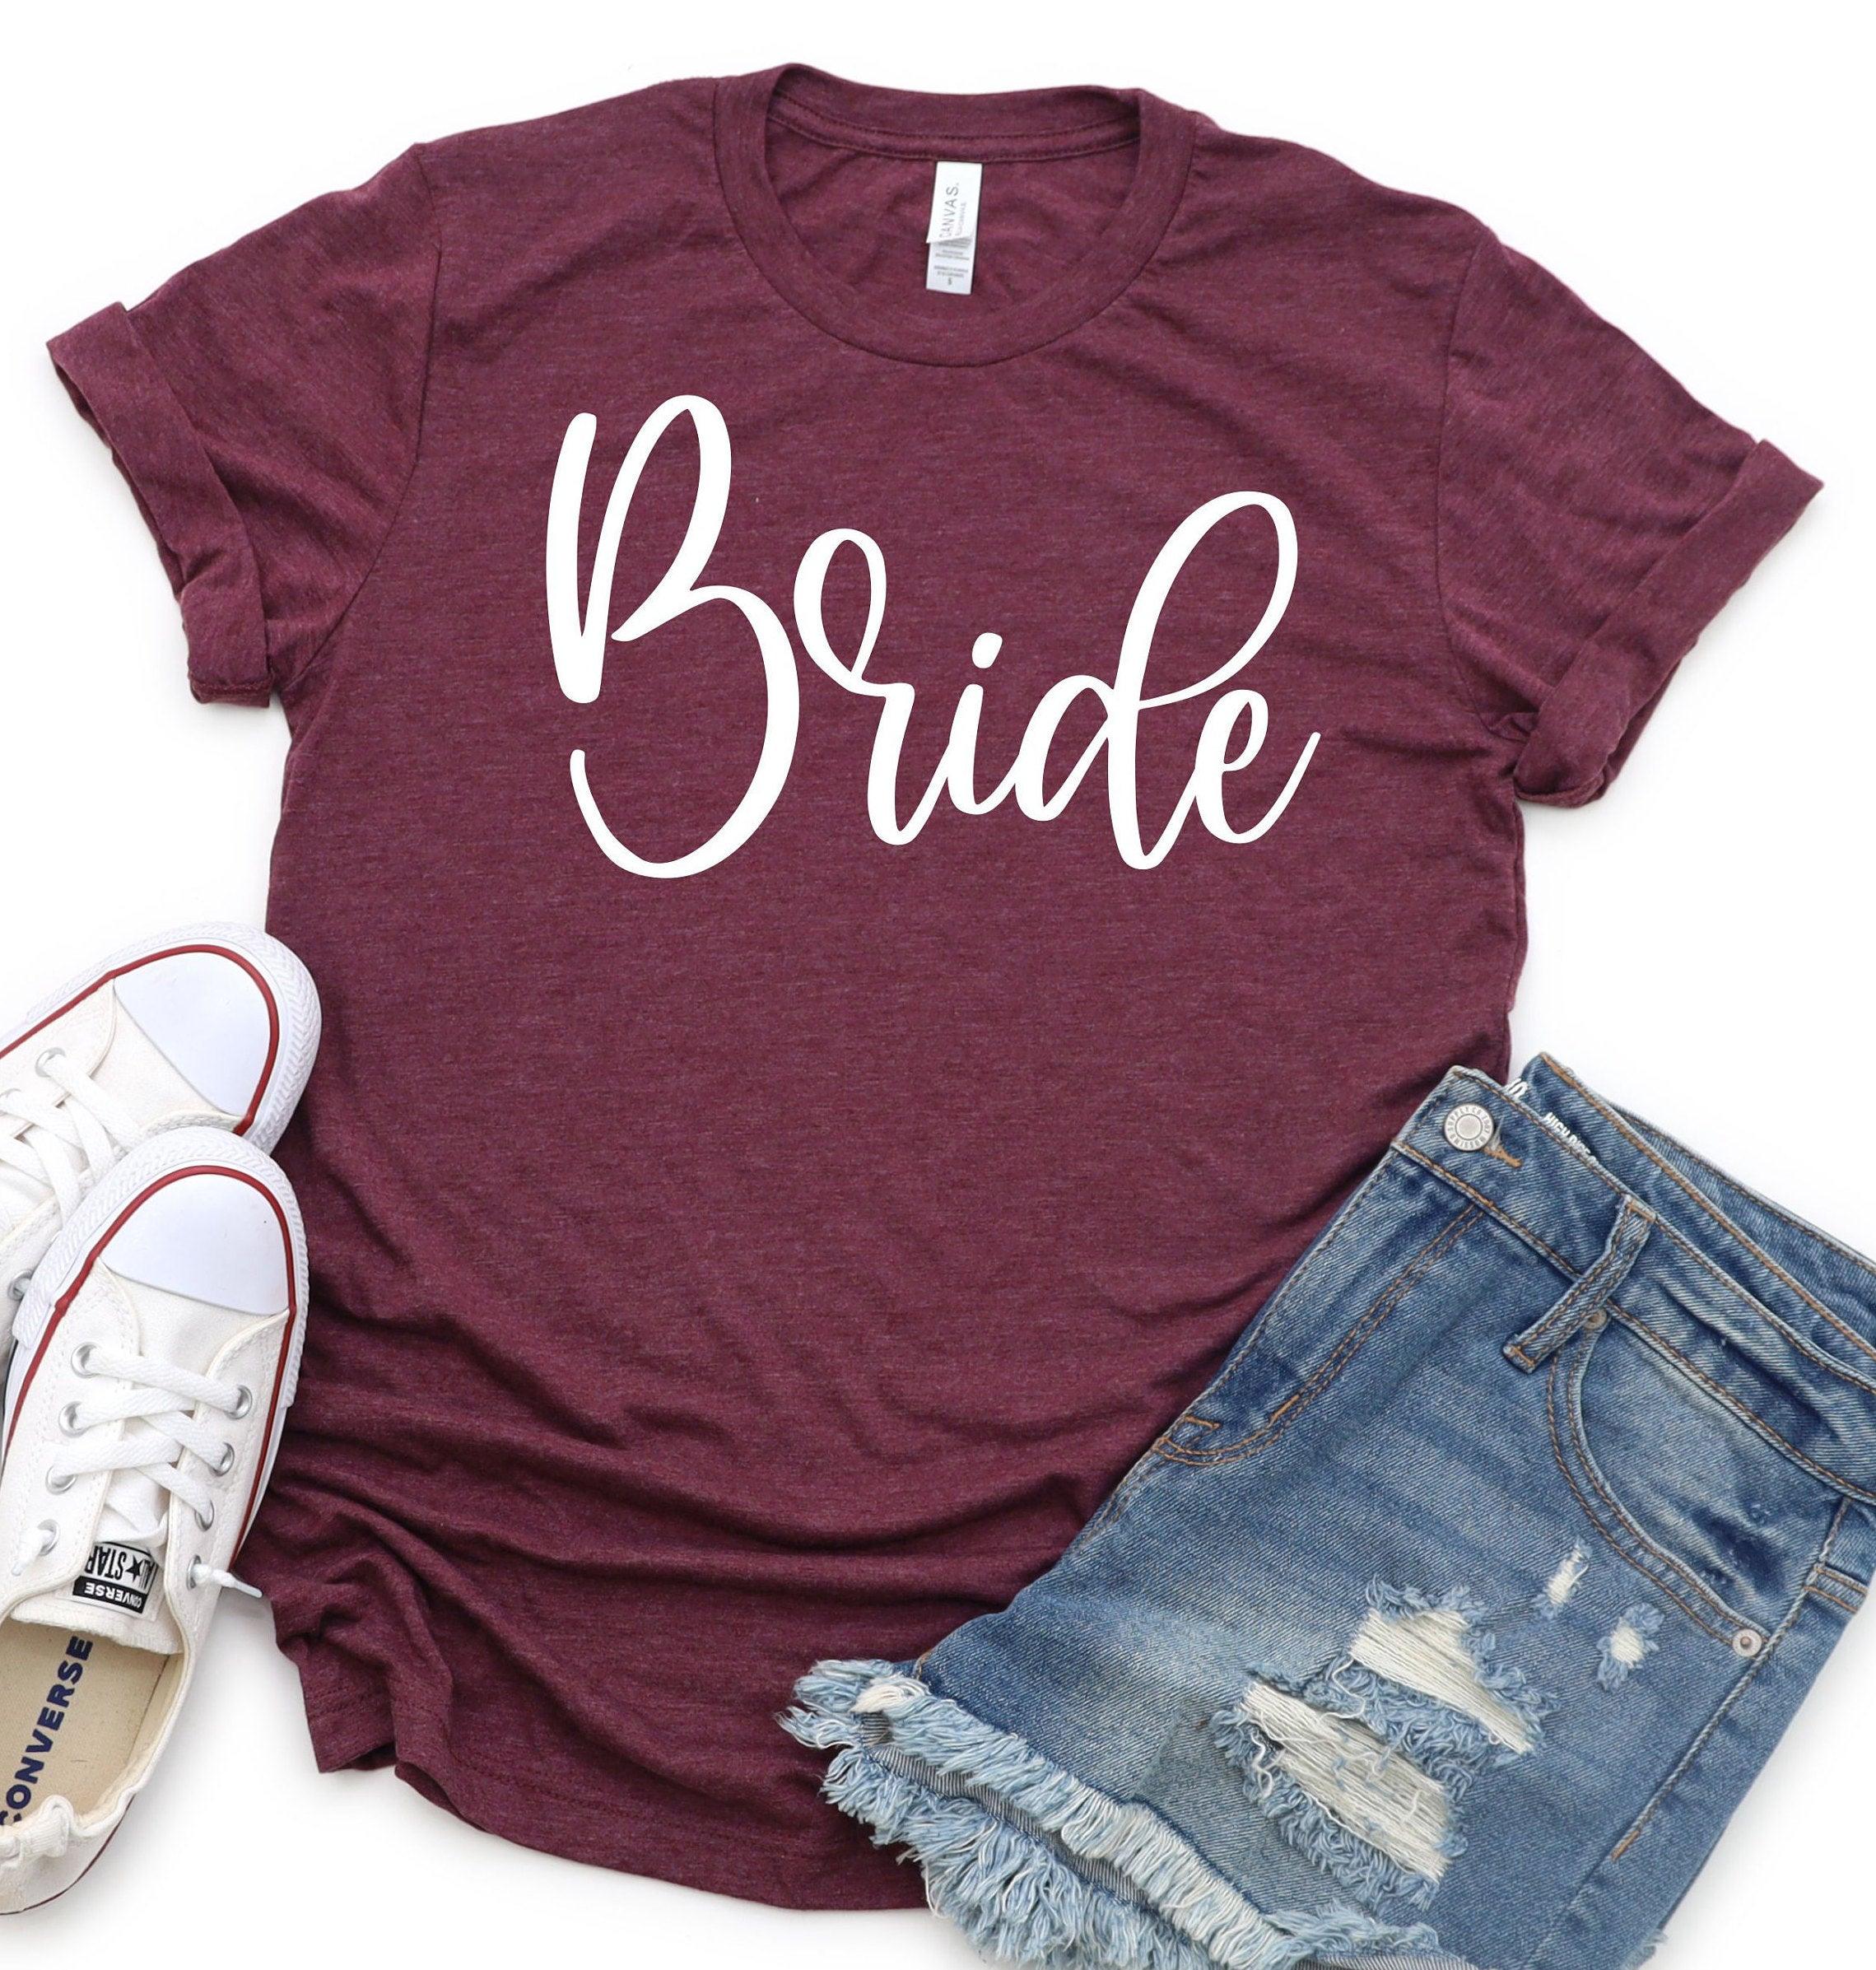 Bride-svg-bride-cut-files-bridesmaid-svg-bridal-party-svg-bachelorette-svg-bridal-svg-designs-wedding-cut-files-svg-for-cricut-60514b30